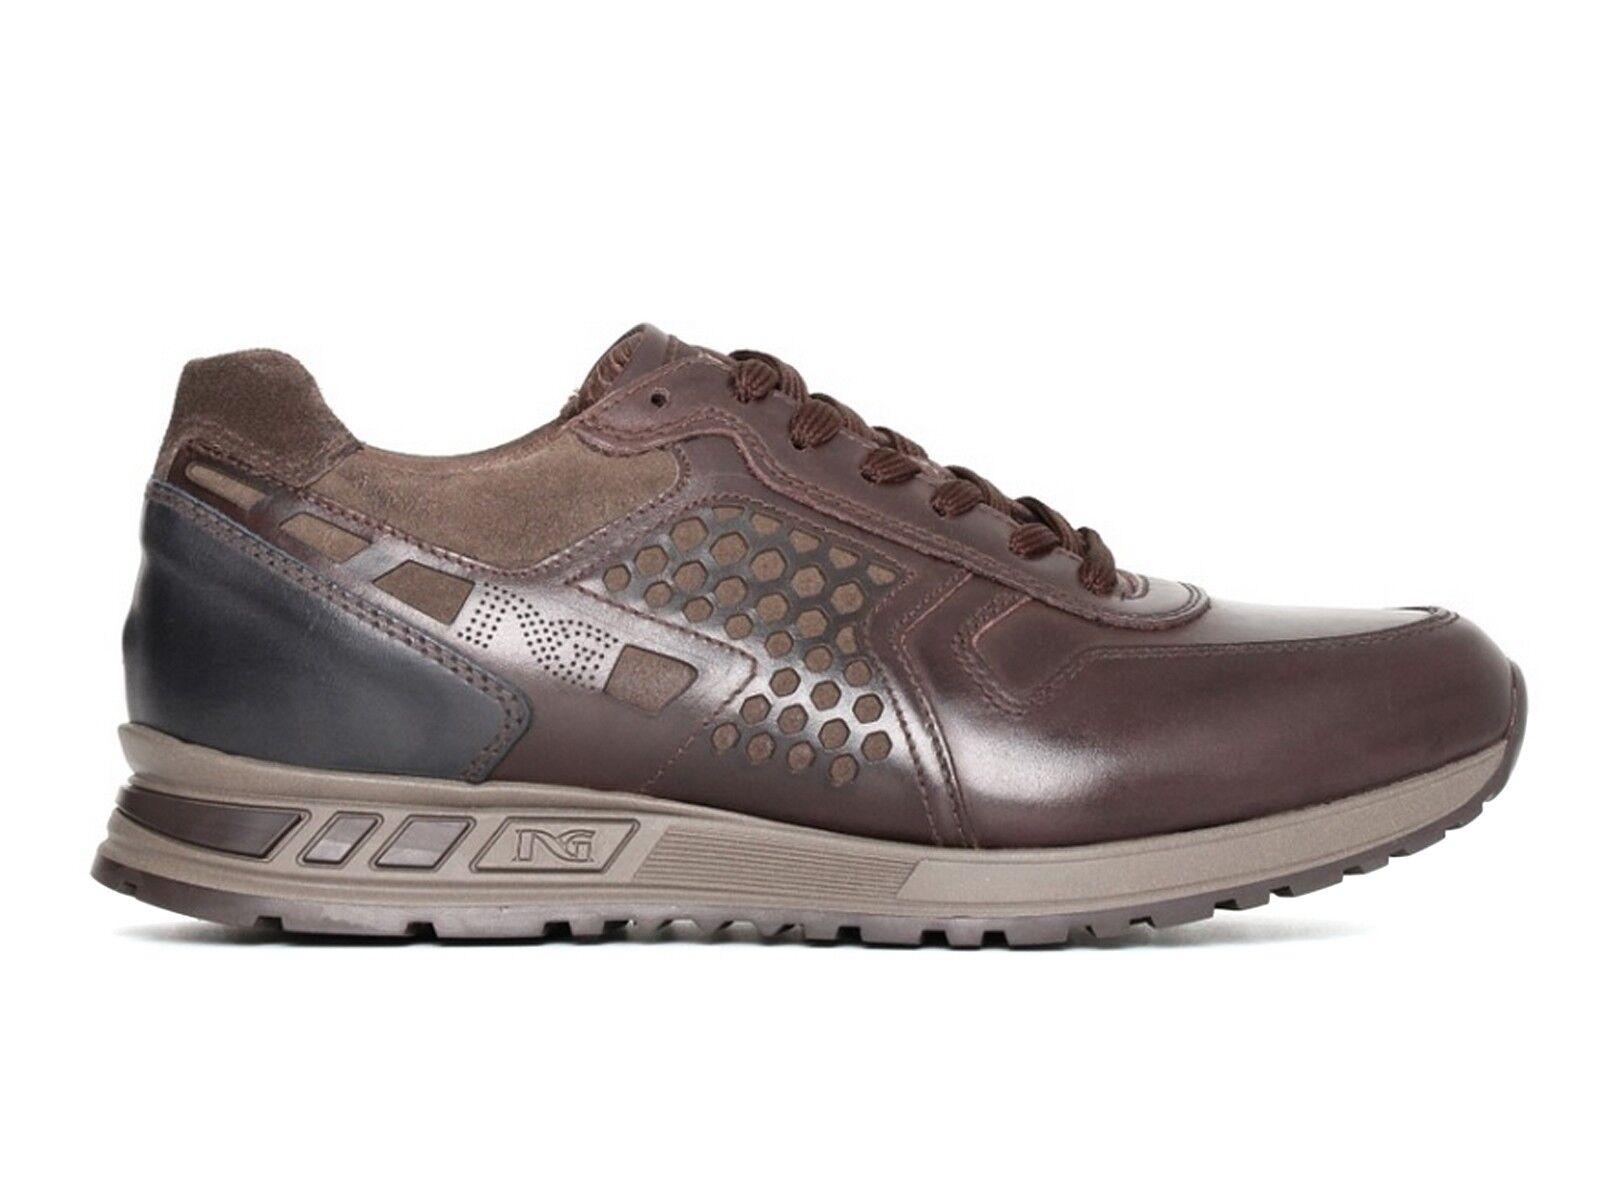 shoes men black GIARDINI INVERNO A705340U 301  SNEAKERS CAFFE